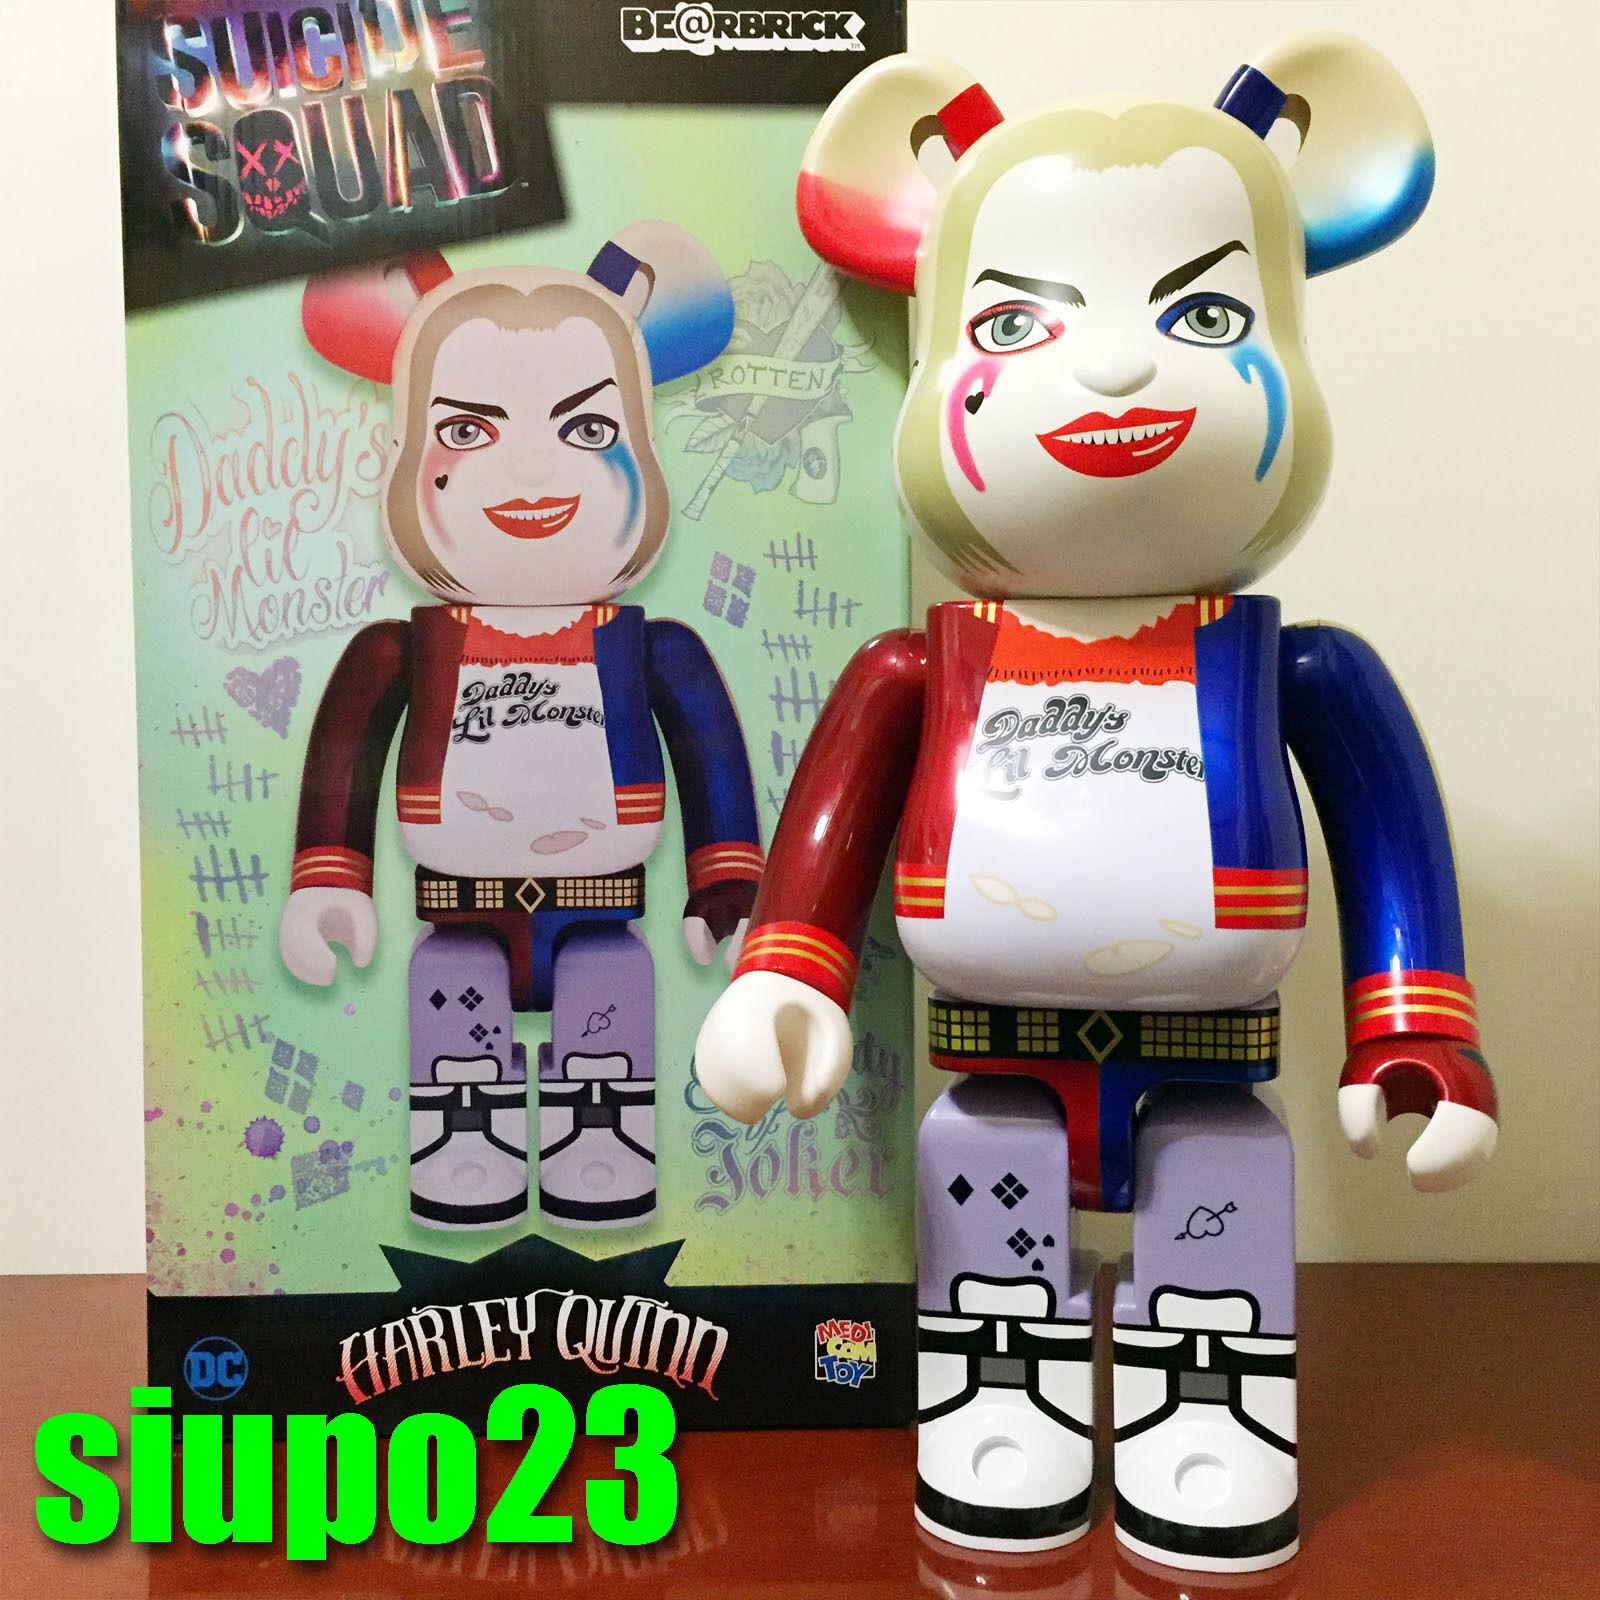 Medicom 1000% orsobrick  Harley Quinn Be@rbrick Suicide Squad